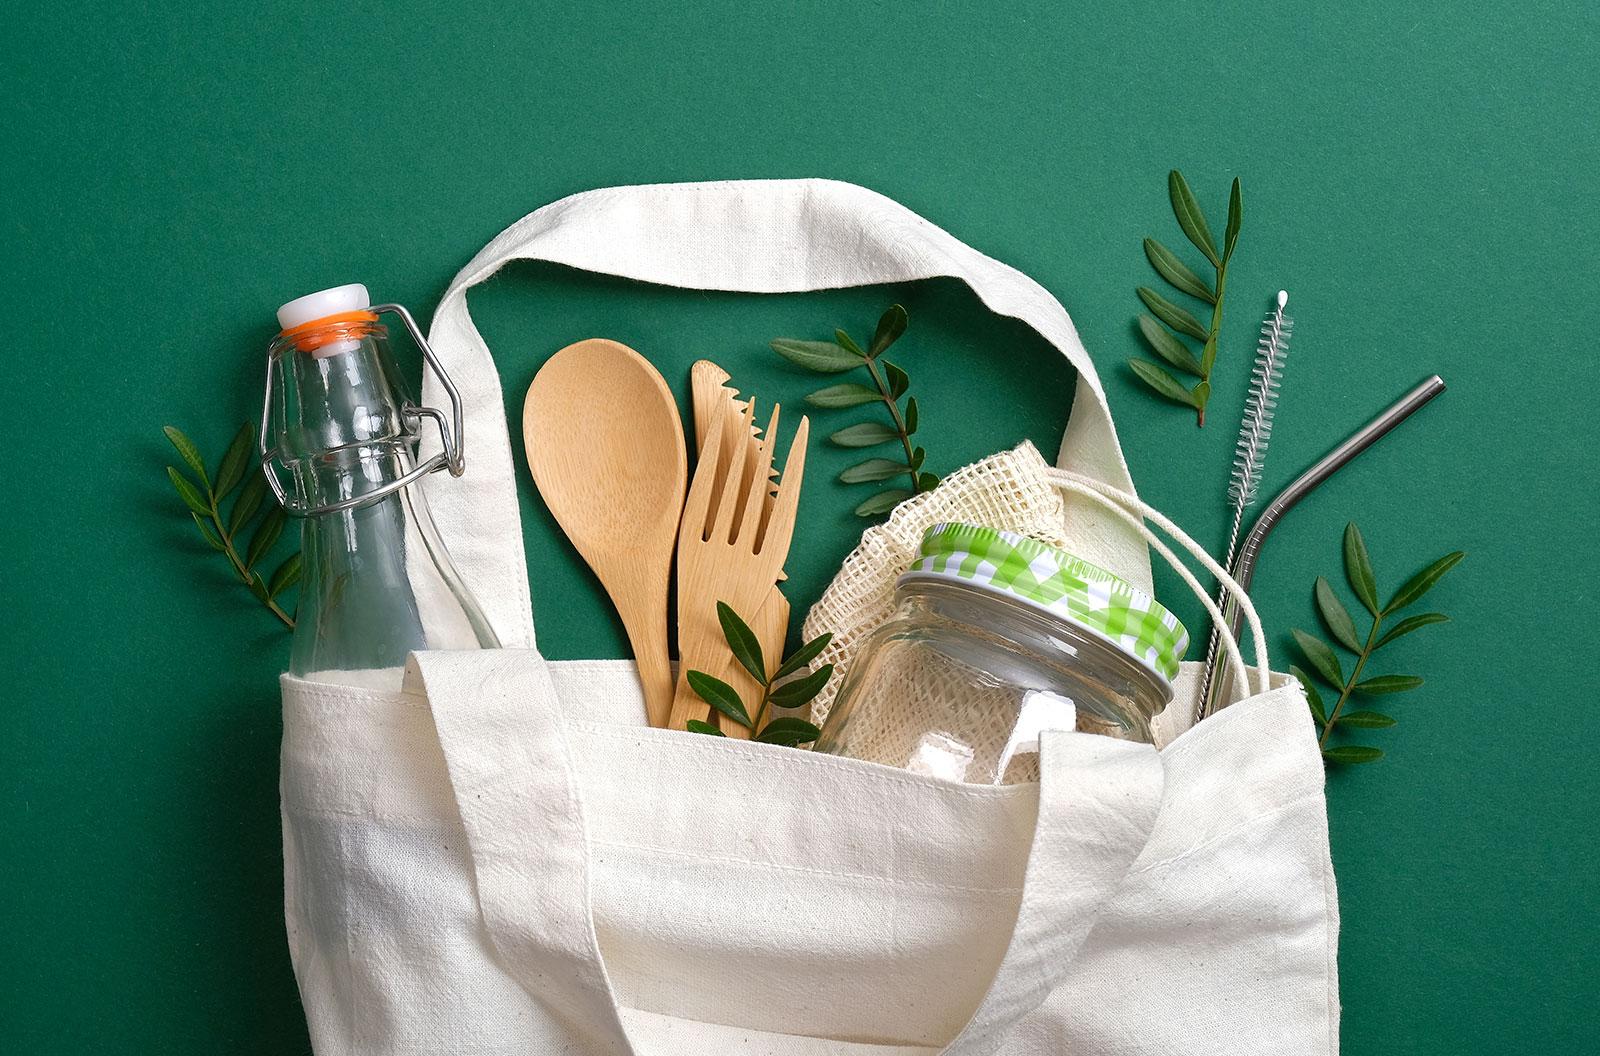 Reusable canvas shopper bag with eco-friendly items inside